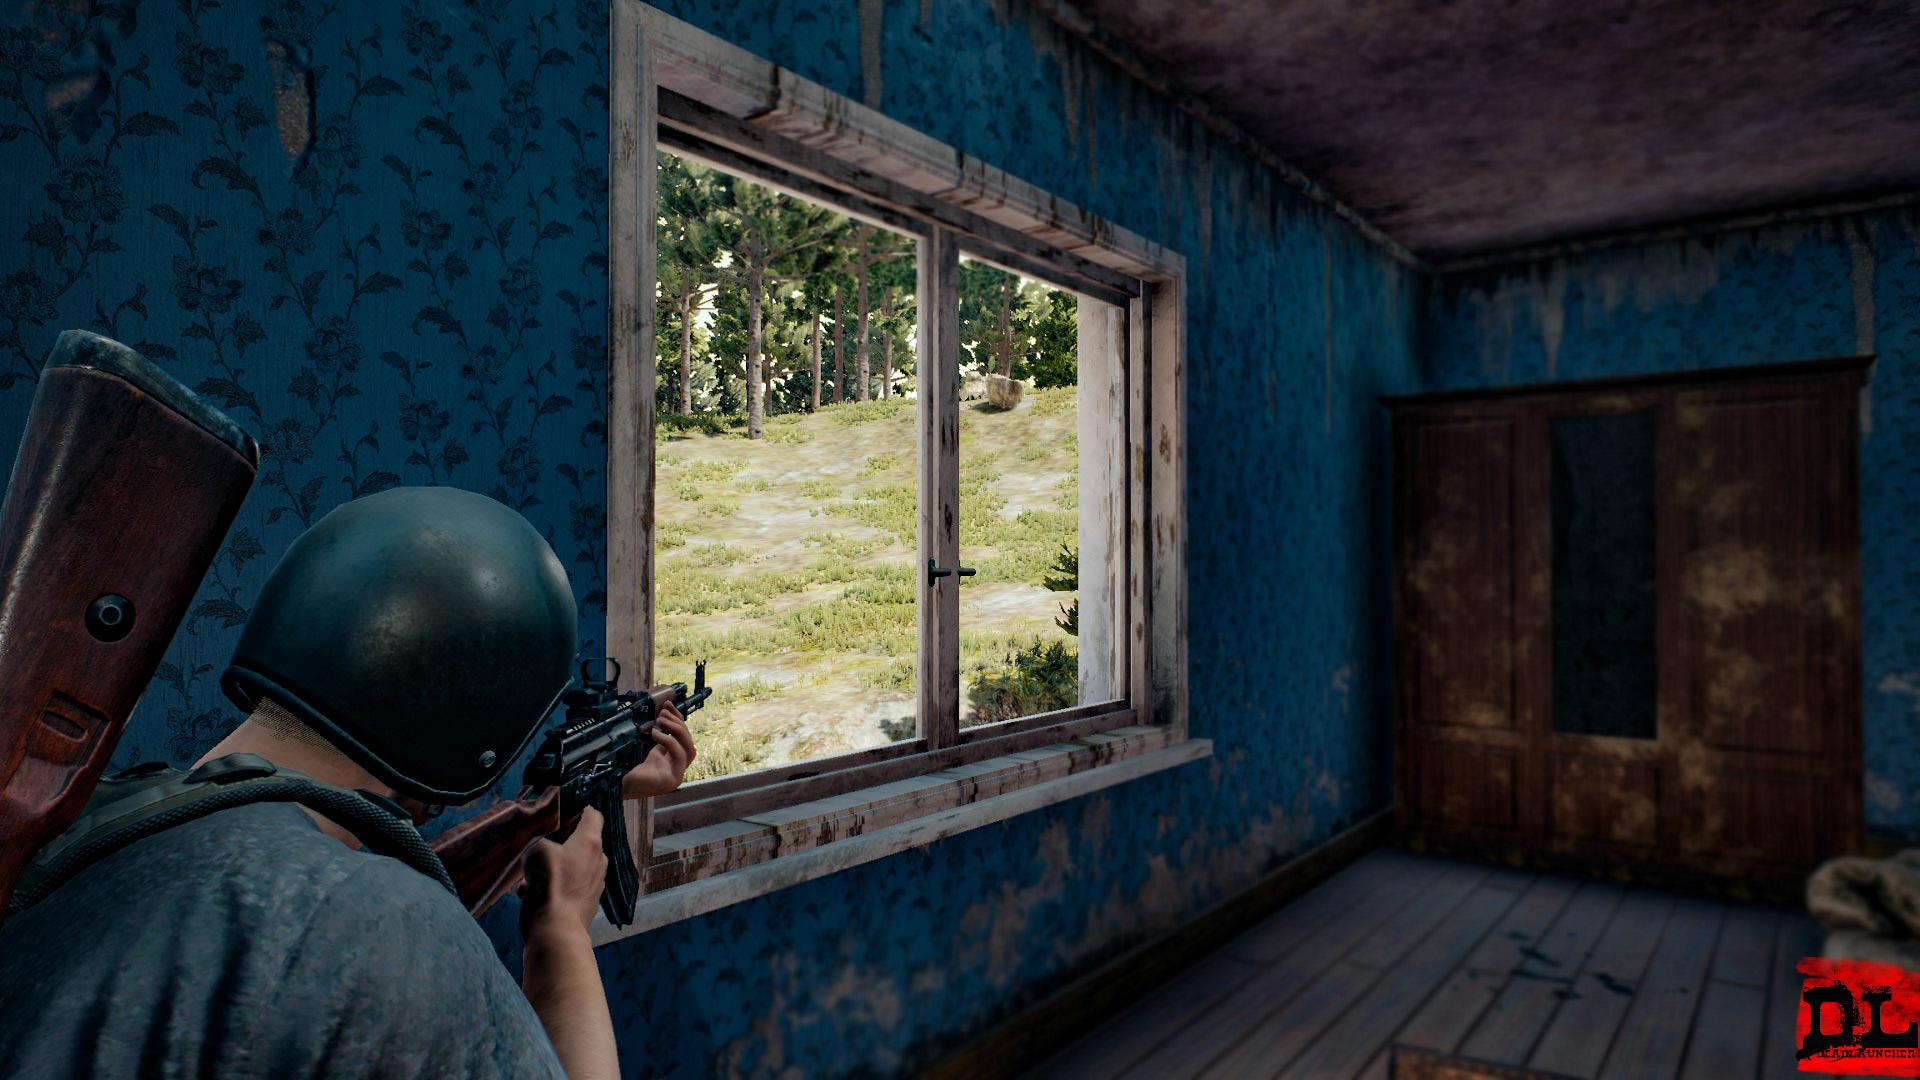 20171114215016_3.jpg - PlayerUnknown's Battlegrounds